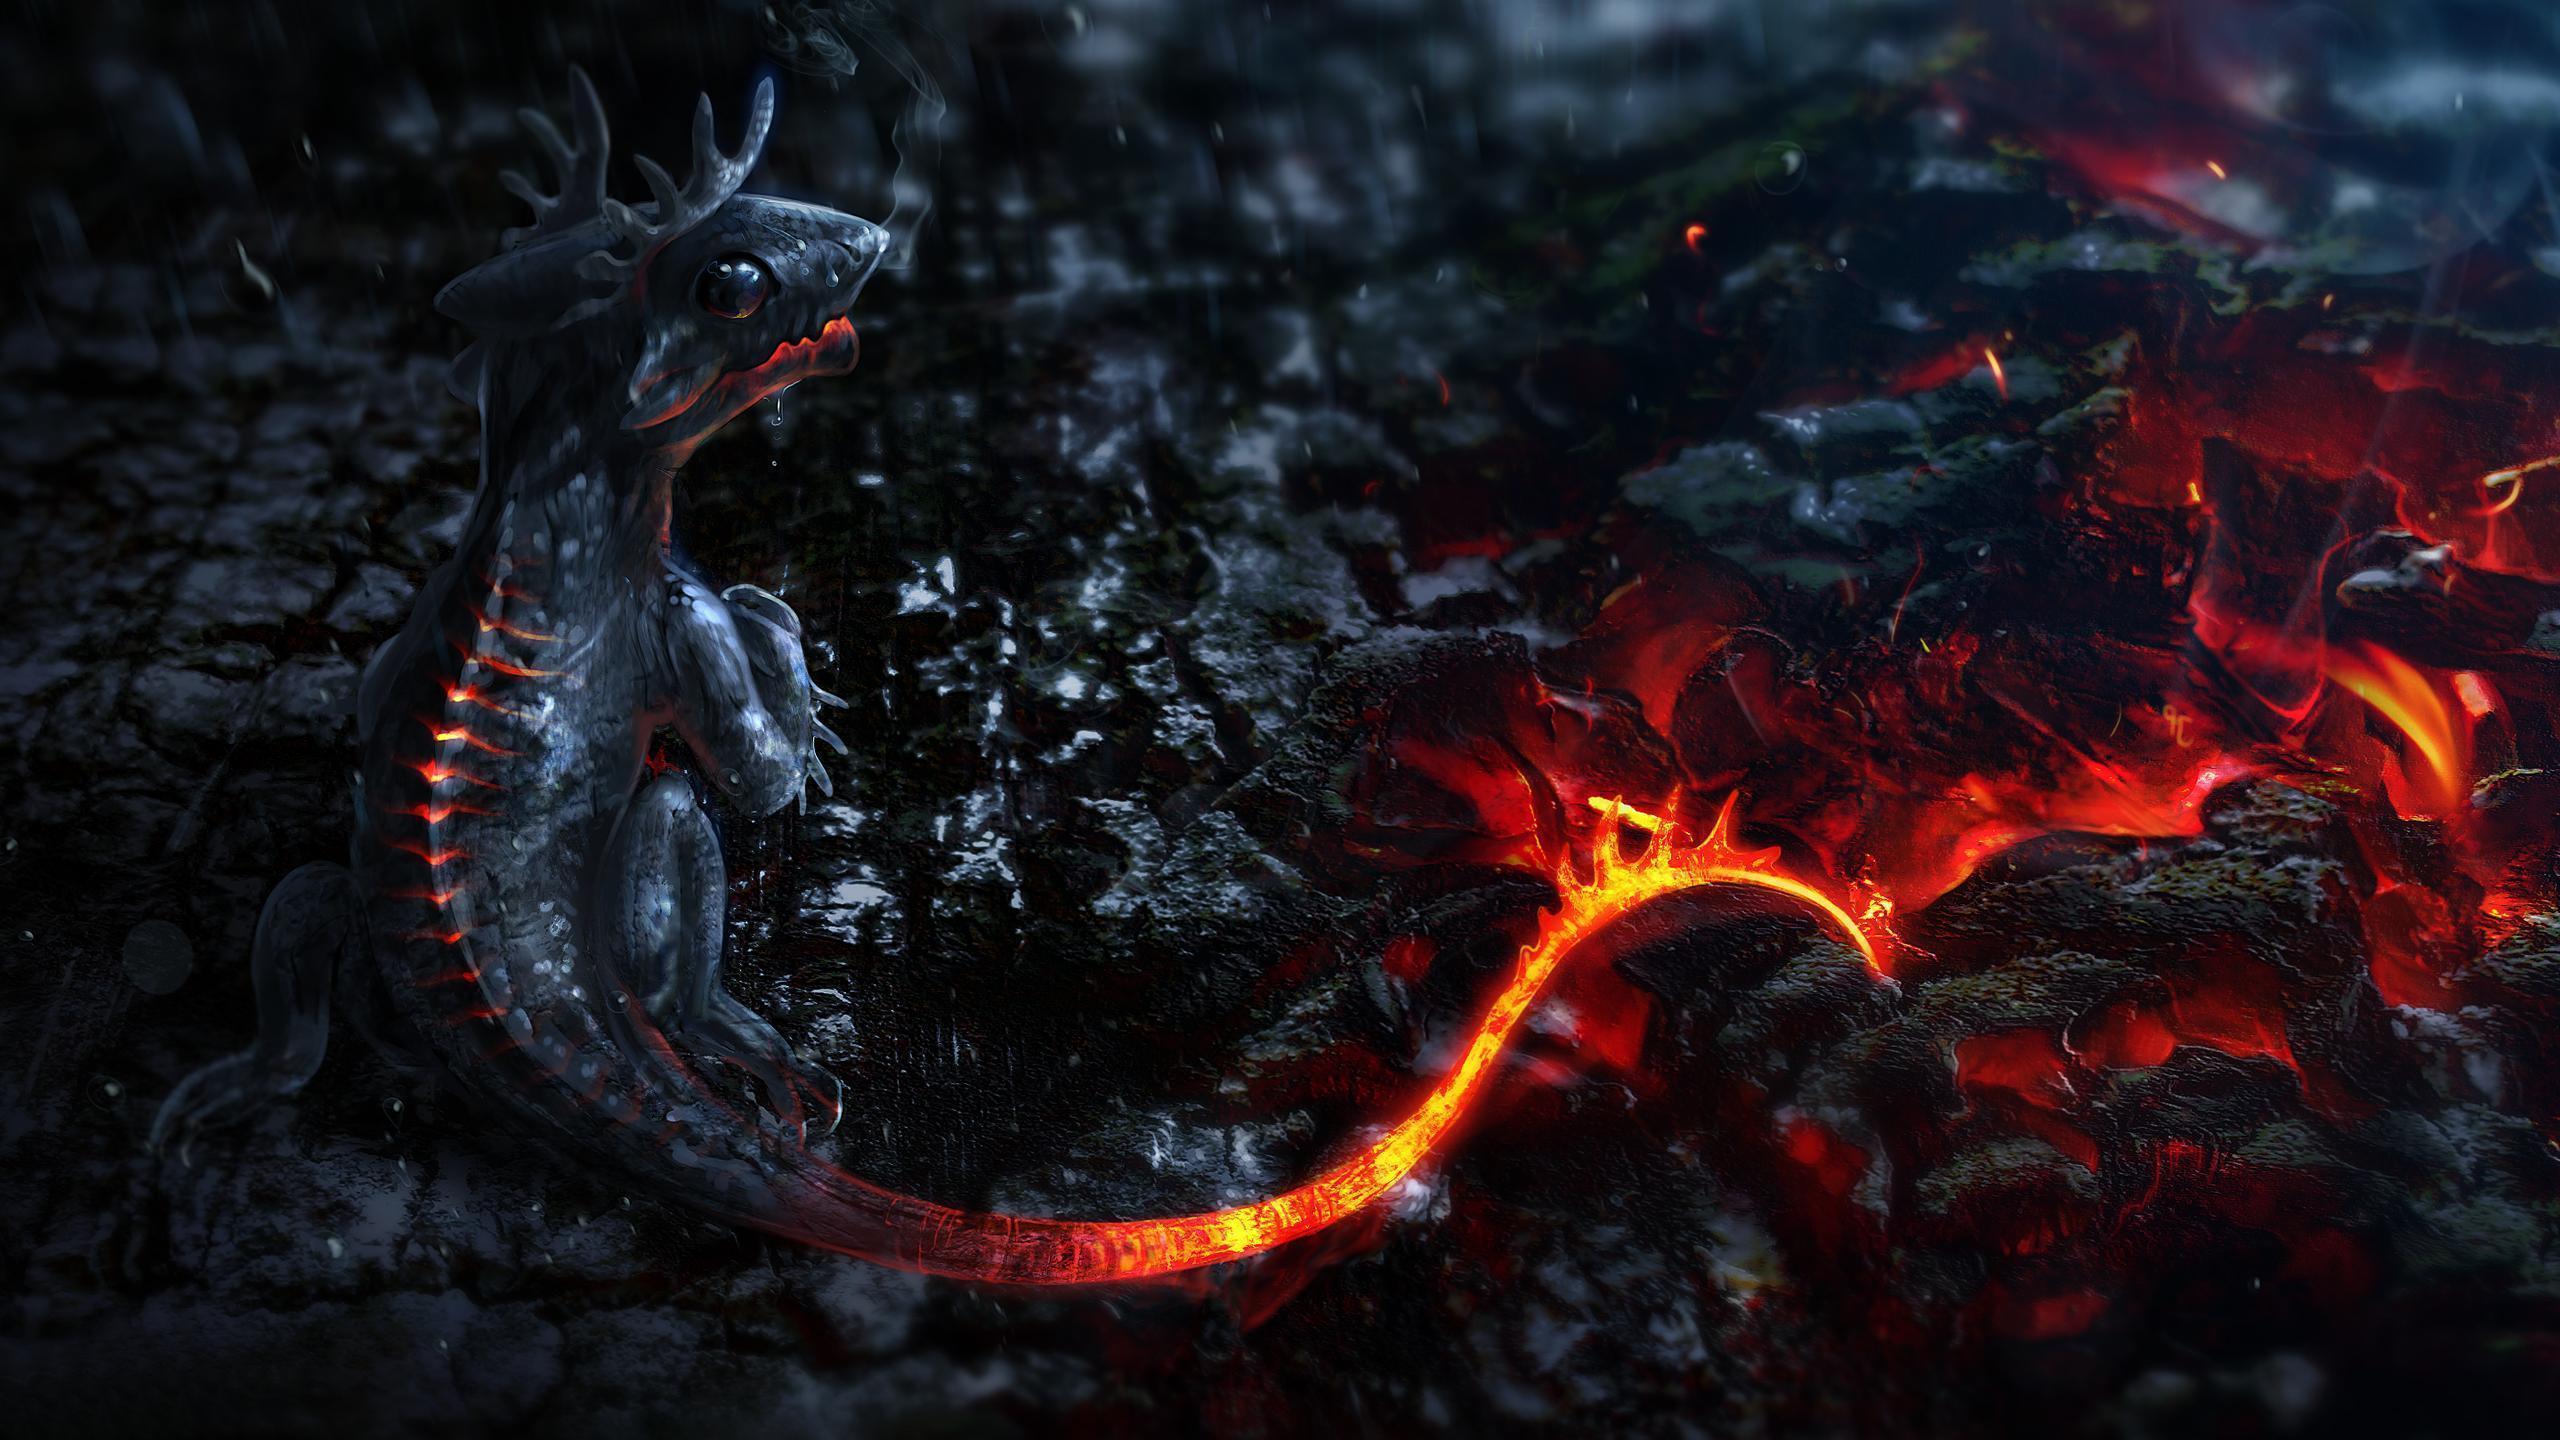 dragon wallpaper widescreen high resolution - photo #30